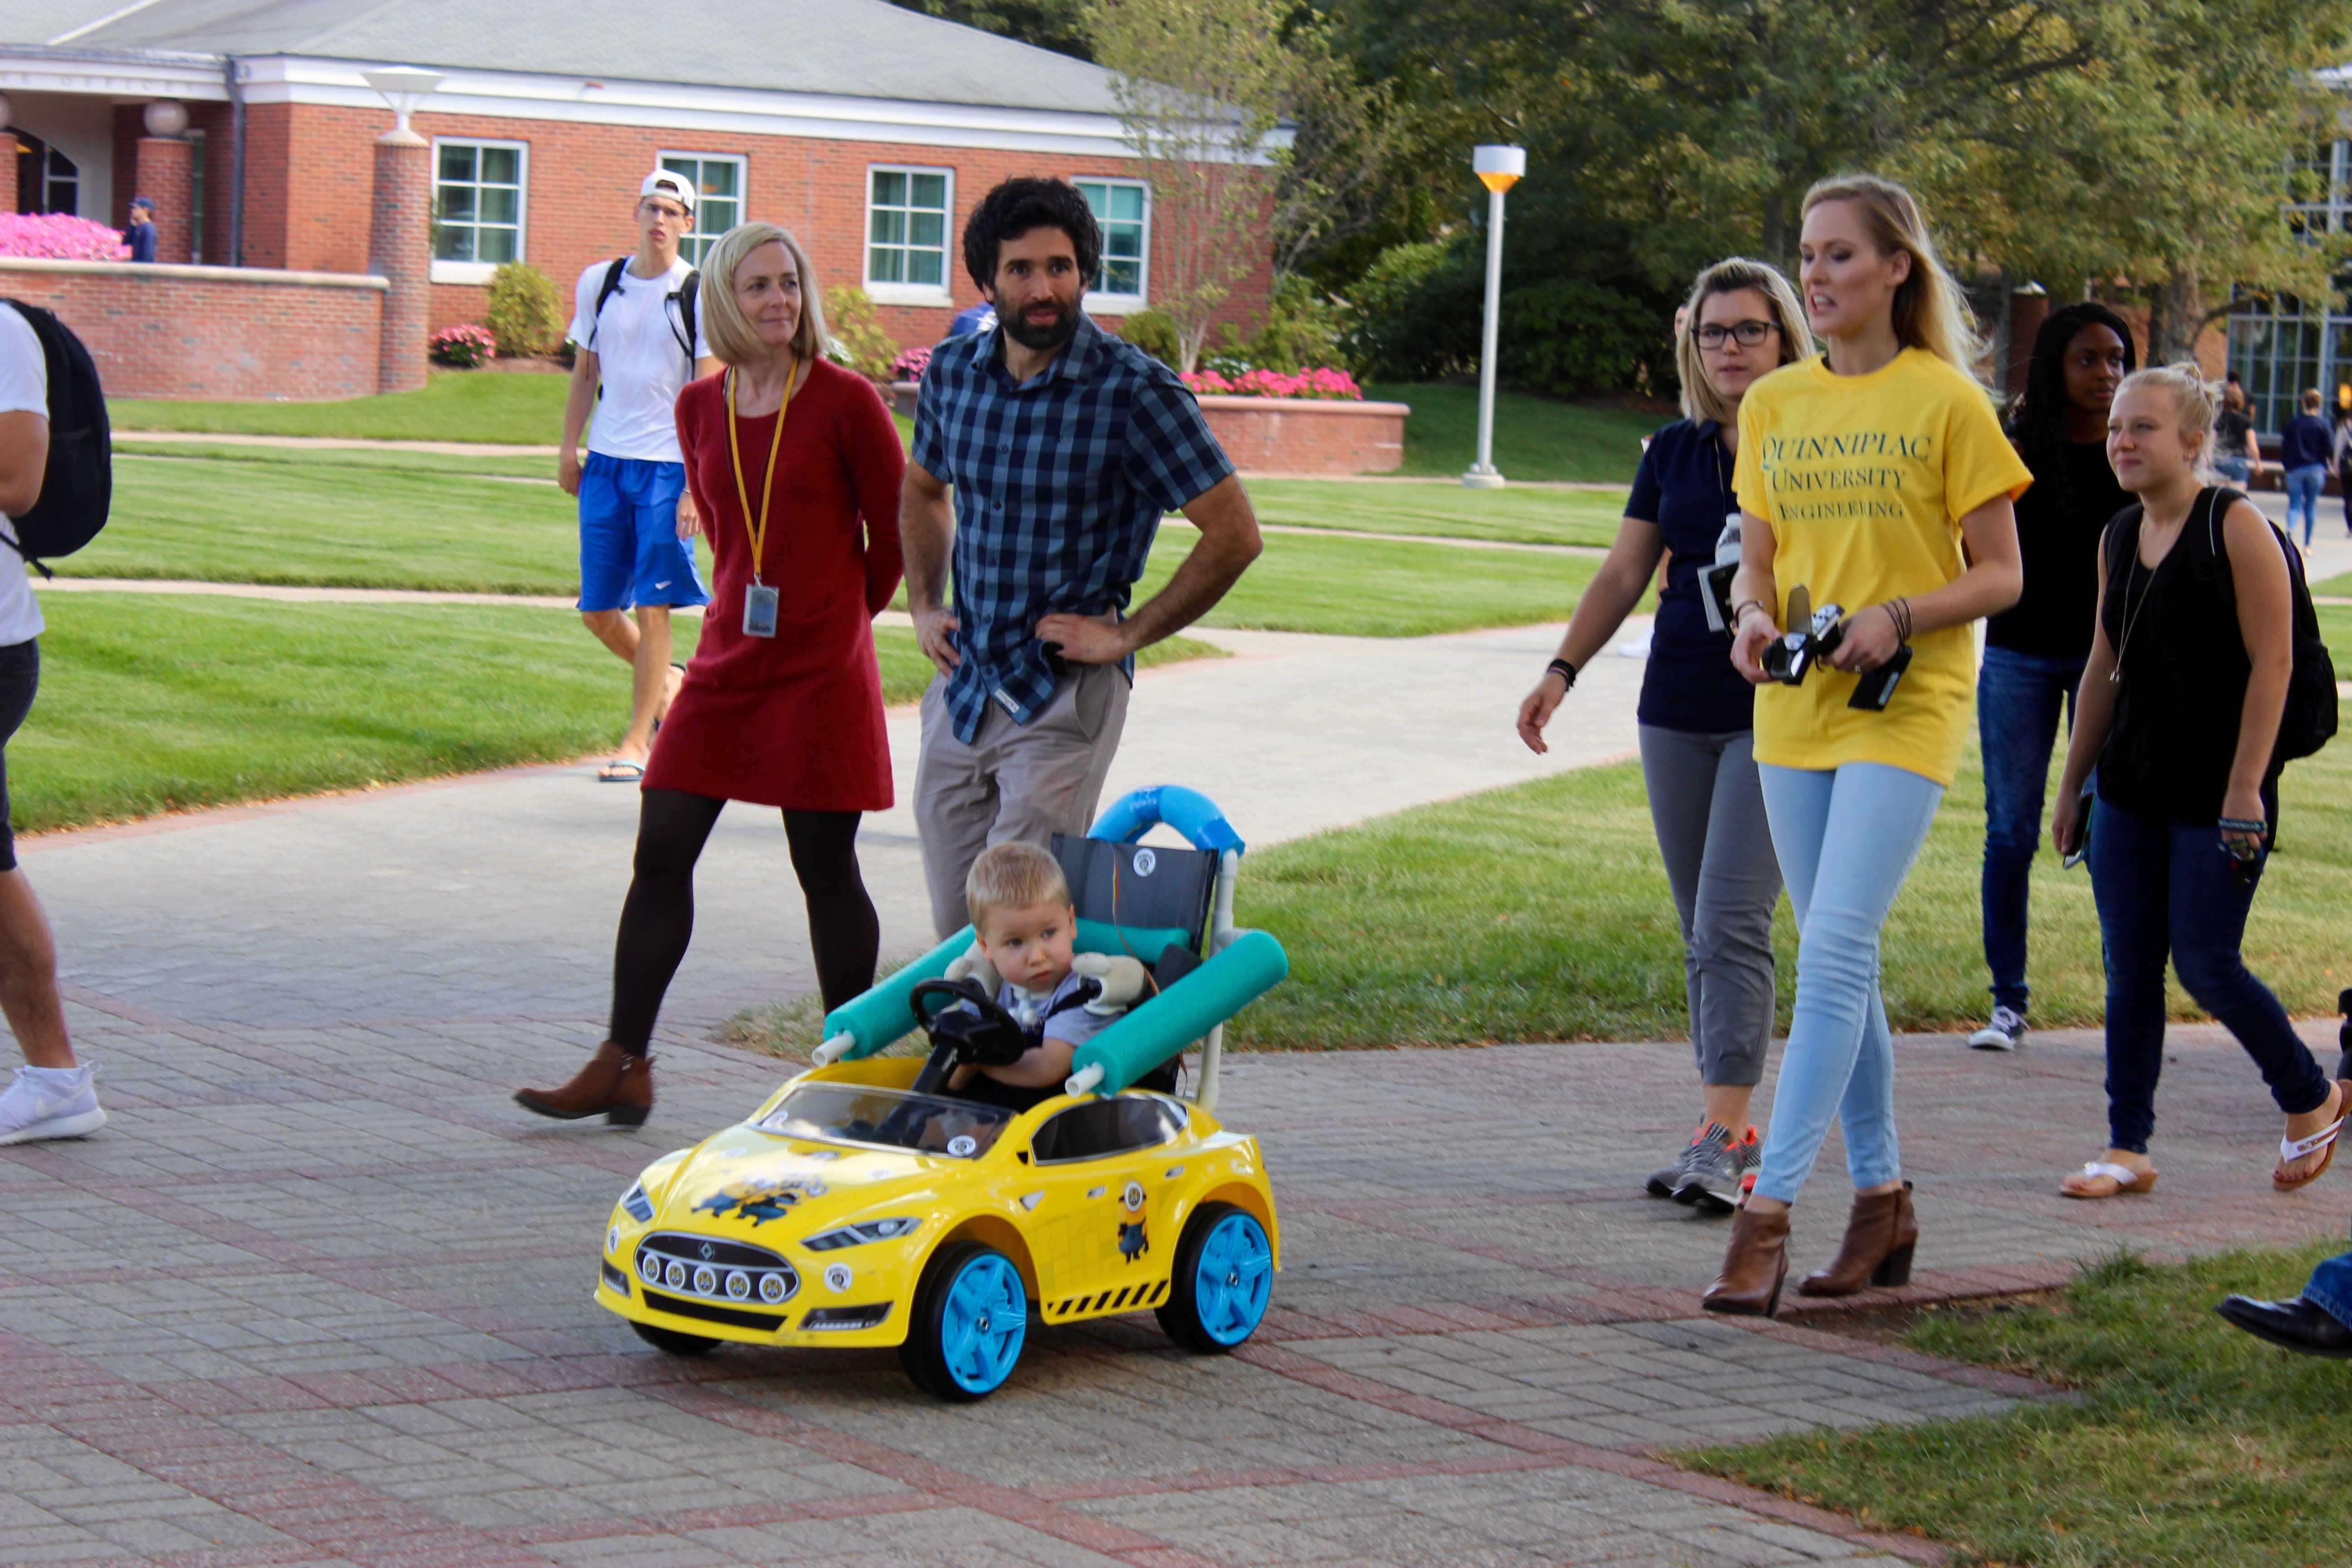 Nolan Green rides around campus in his custom built car, created in part by engineering student Rachel Davis.